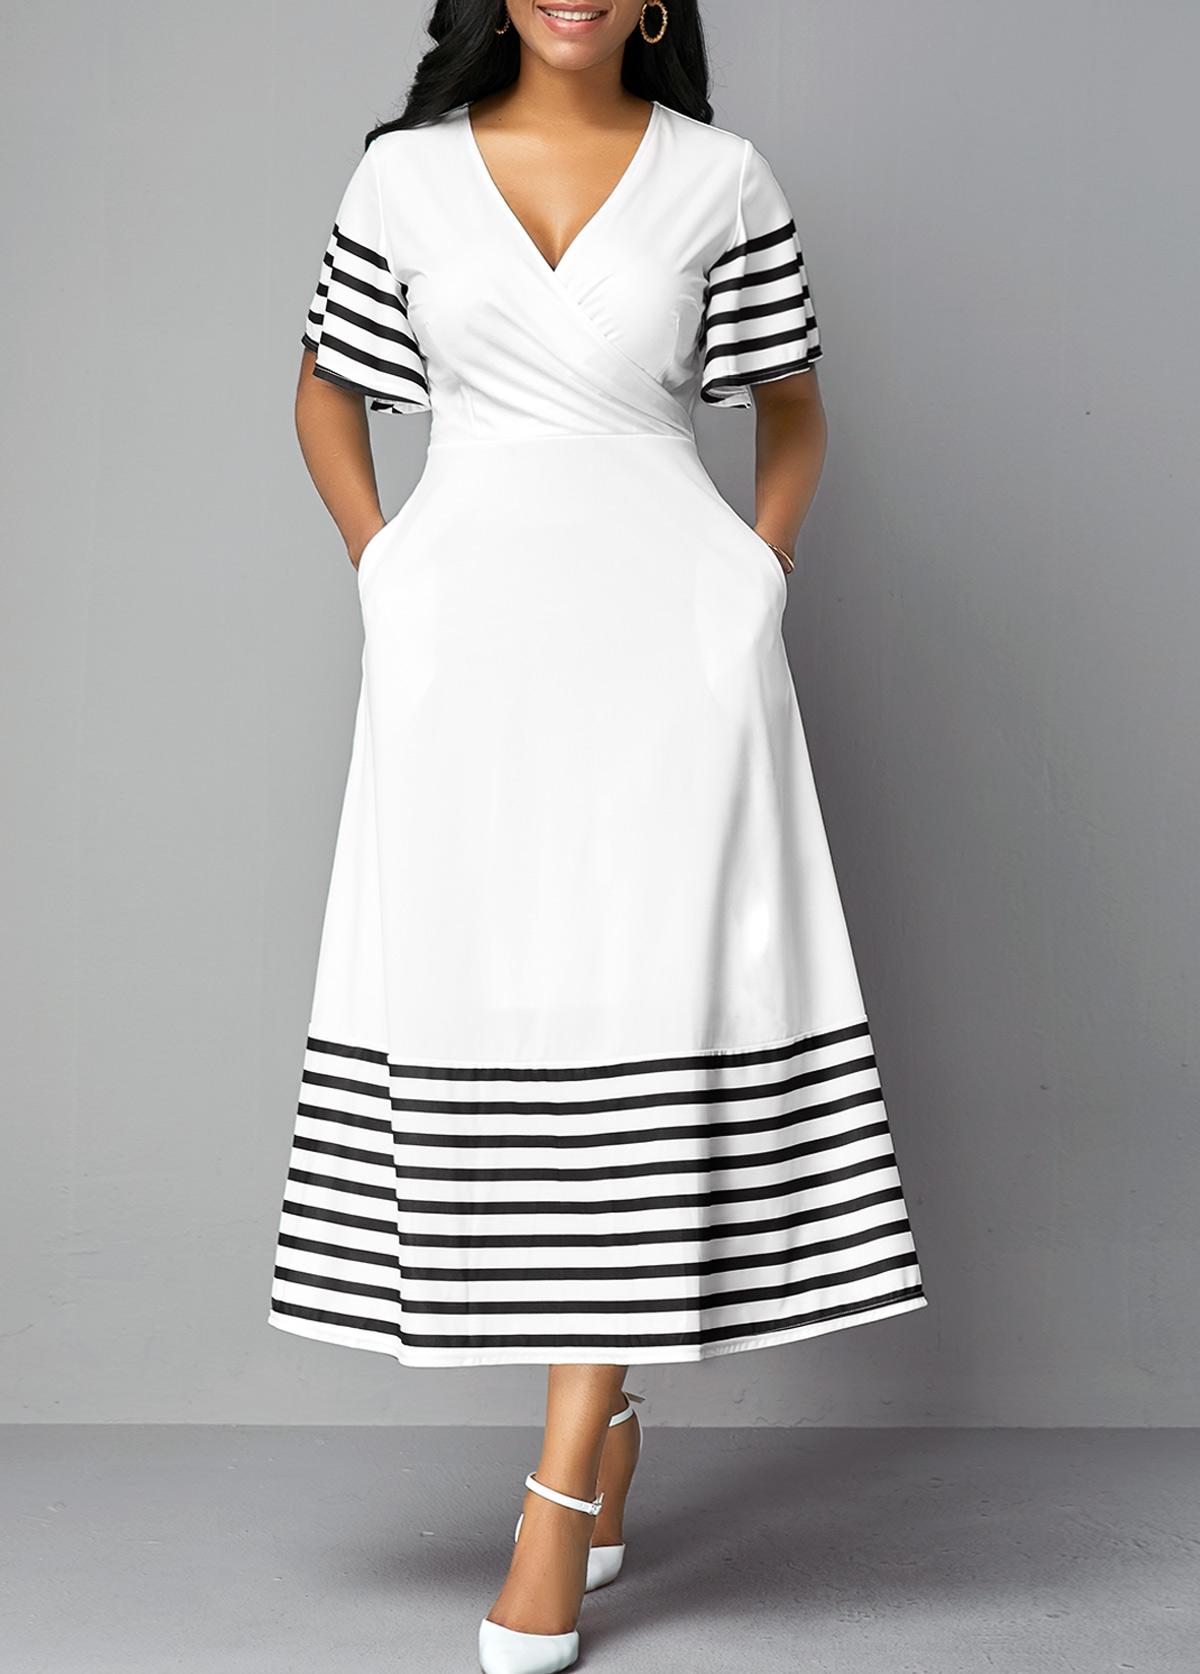 ROTITA Double Side Pockets Striped Short Sleeve Dress